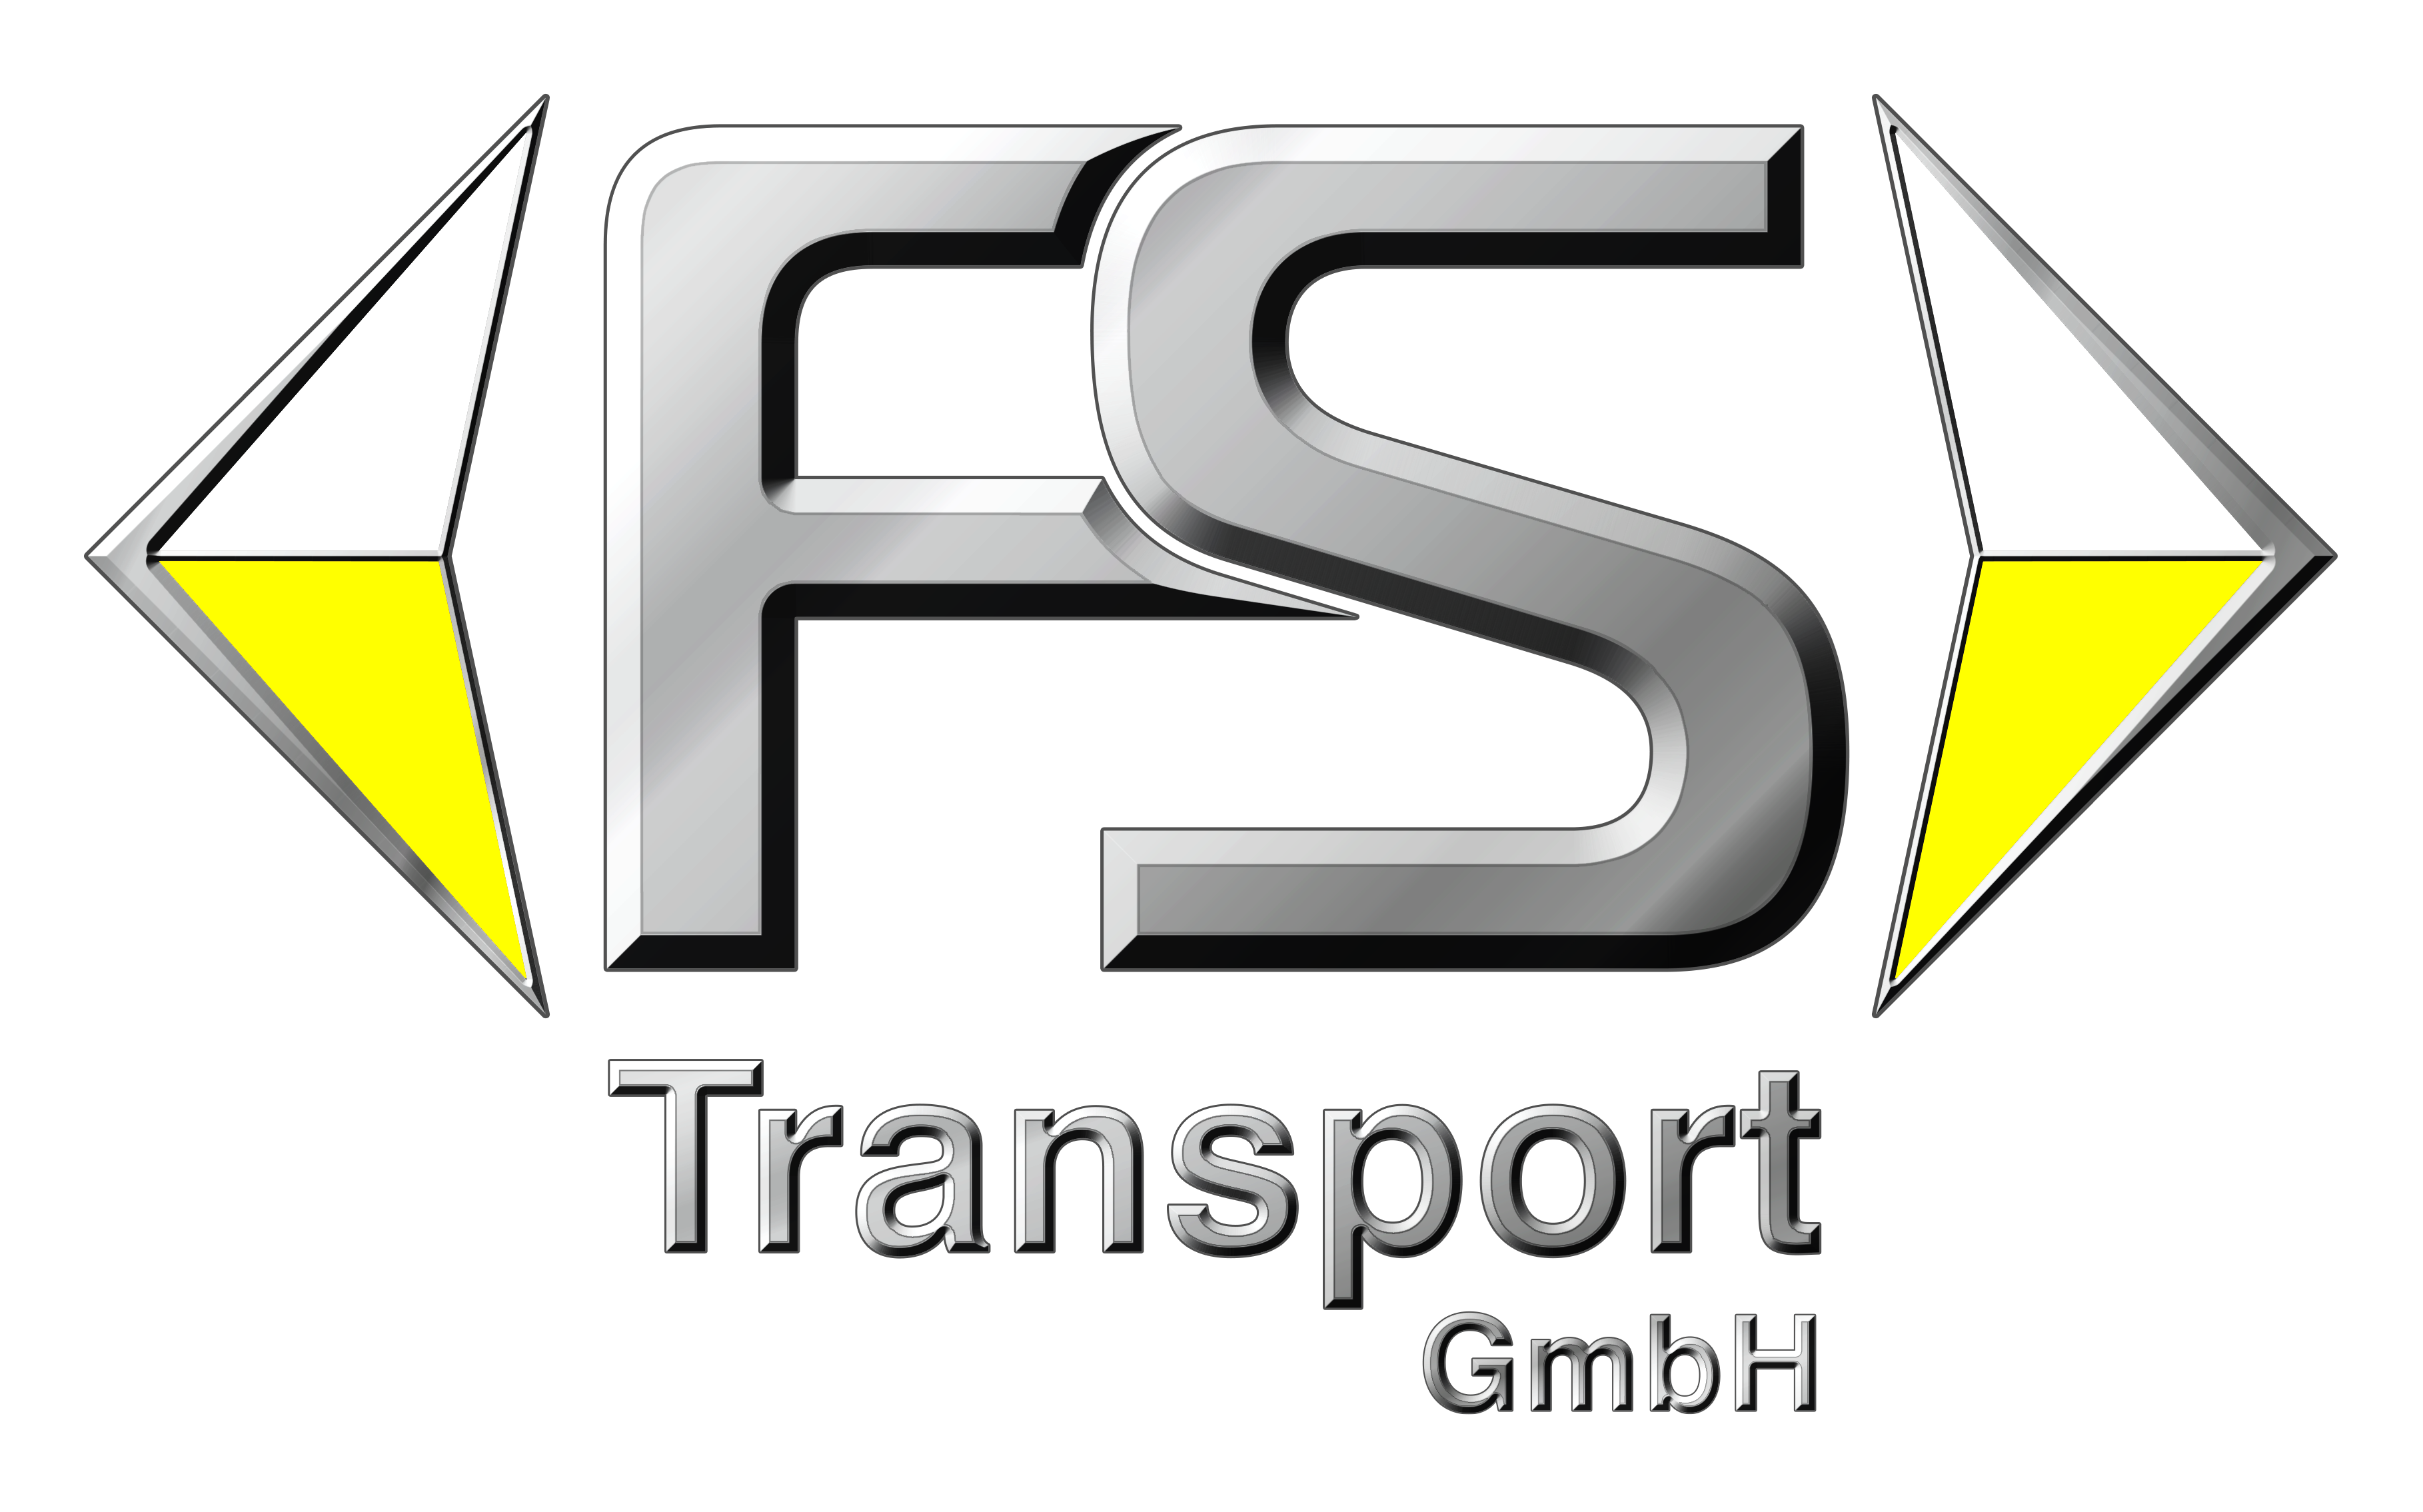 FS Transport GmbH